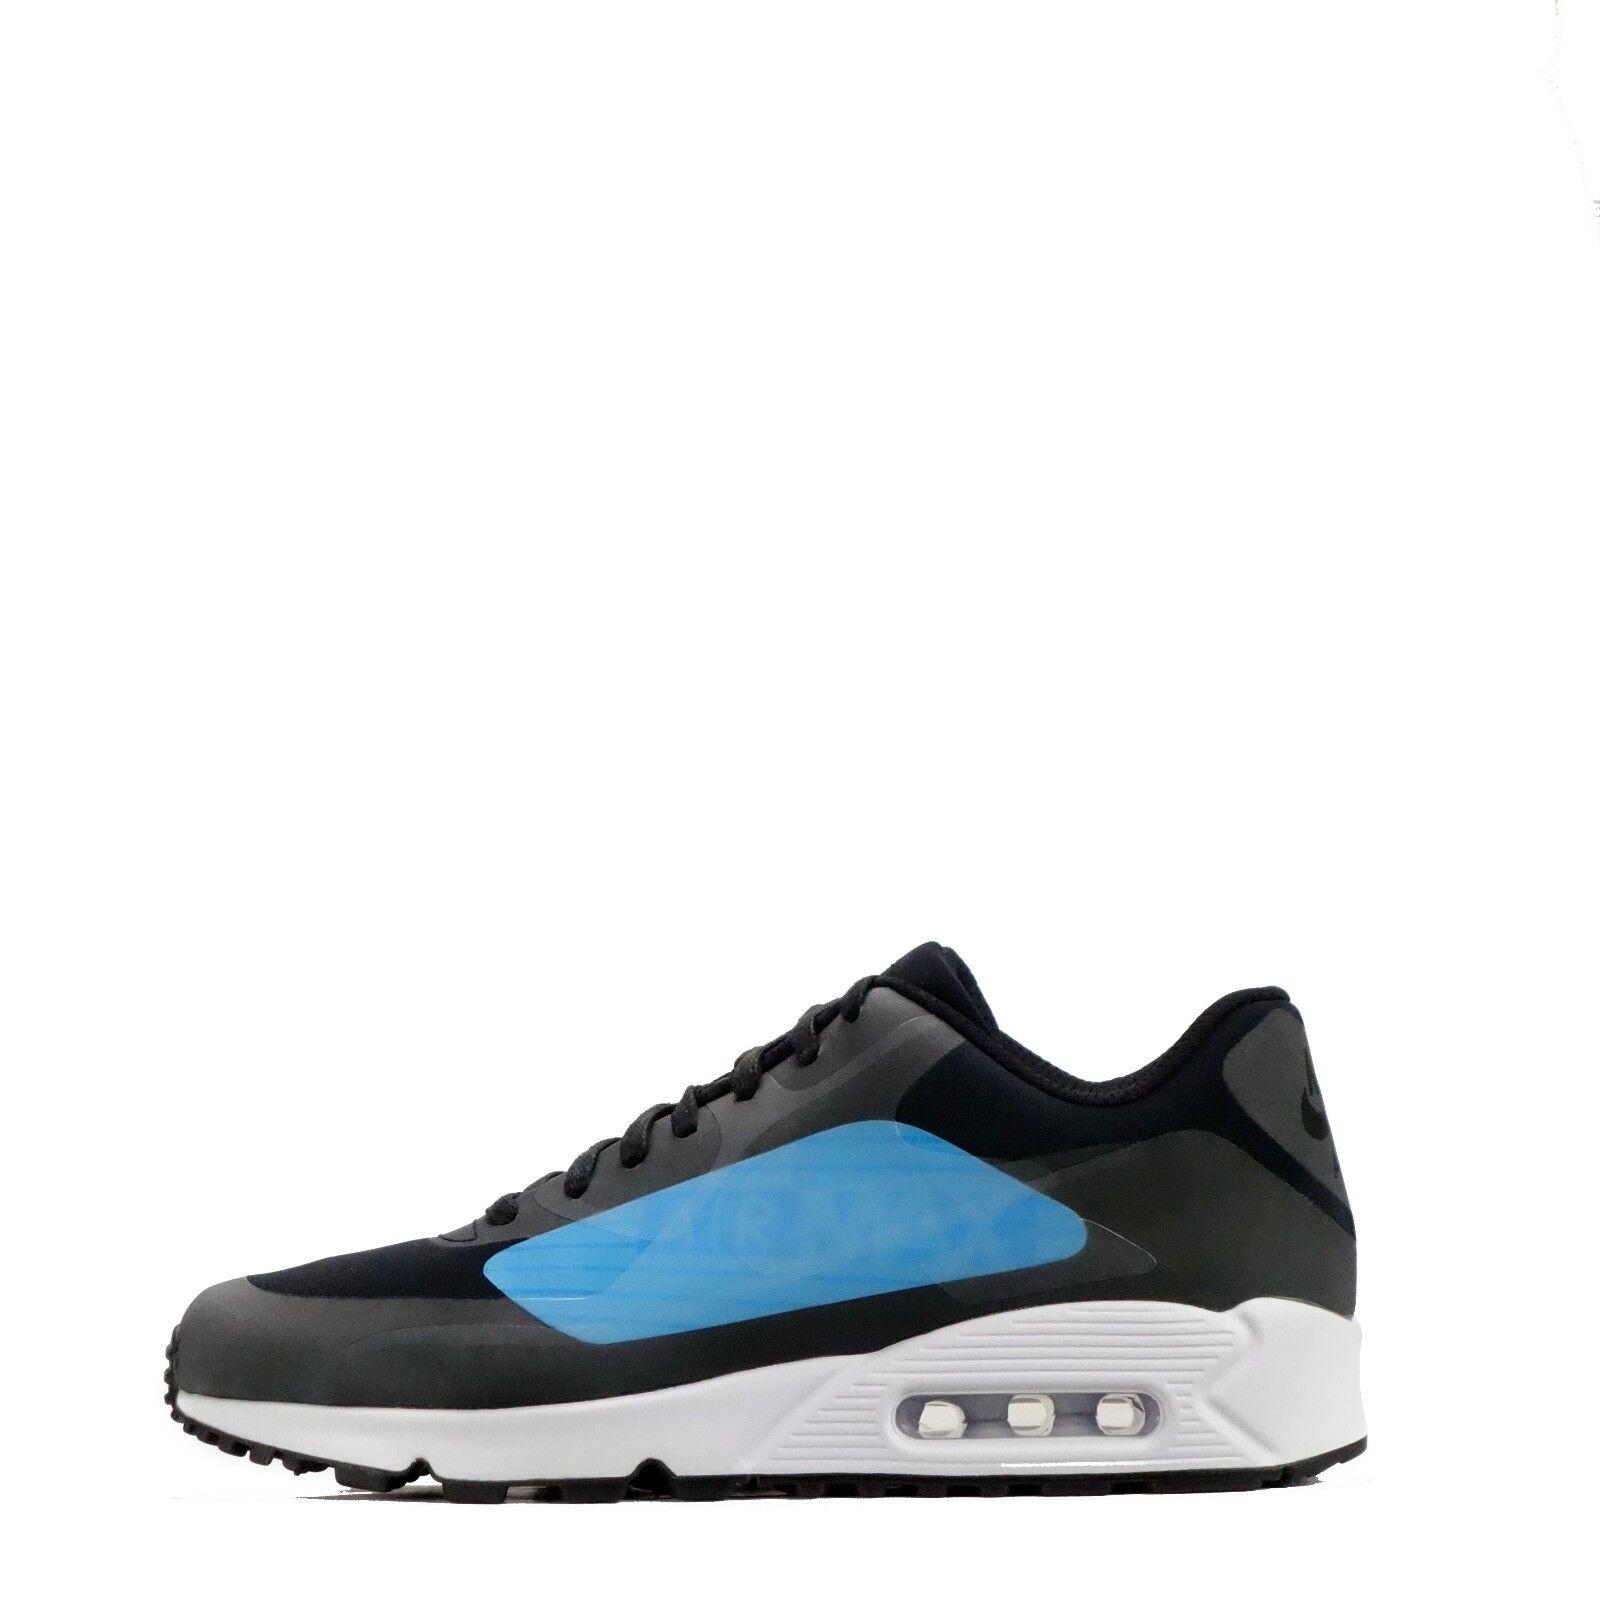 Nike Air Max 90 NS GPX Big Logo Men's Casual Gym Shoes Black/Blue RRP £119.99